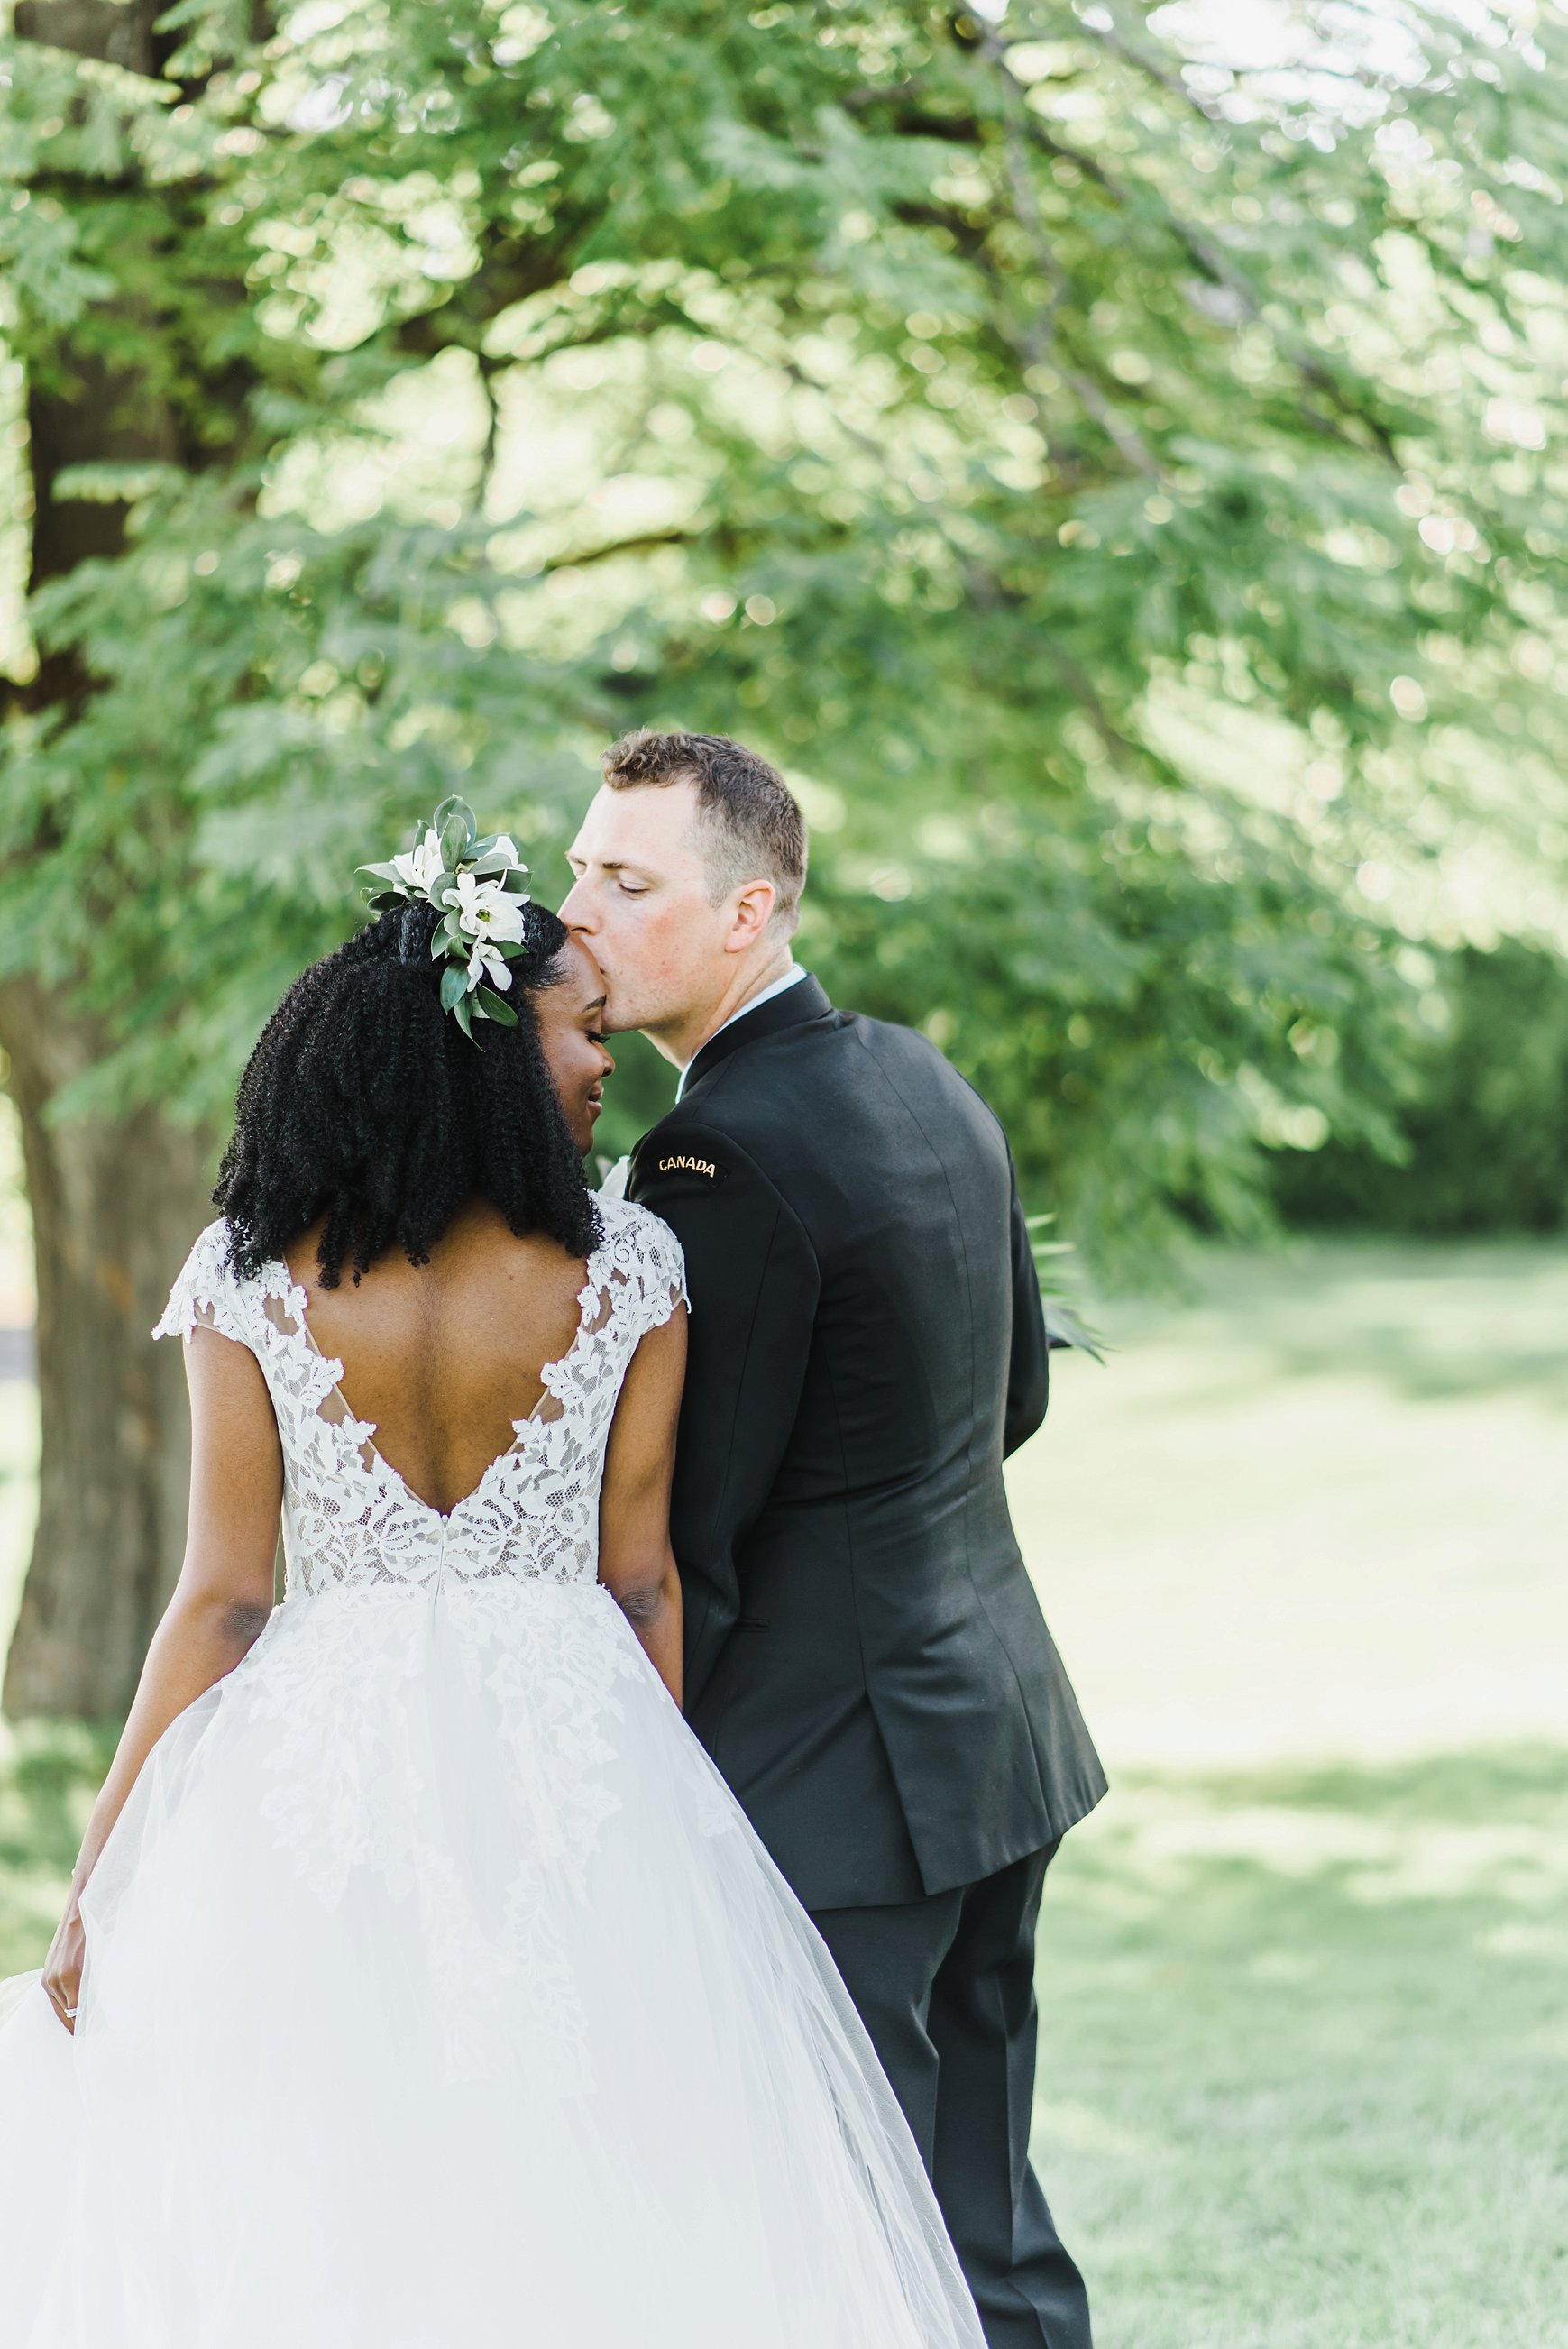 light airy indie fine art ottawa wedding photographer | Ali and Batoul Photography_1007.jpg